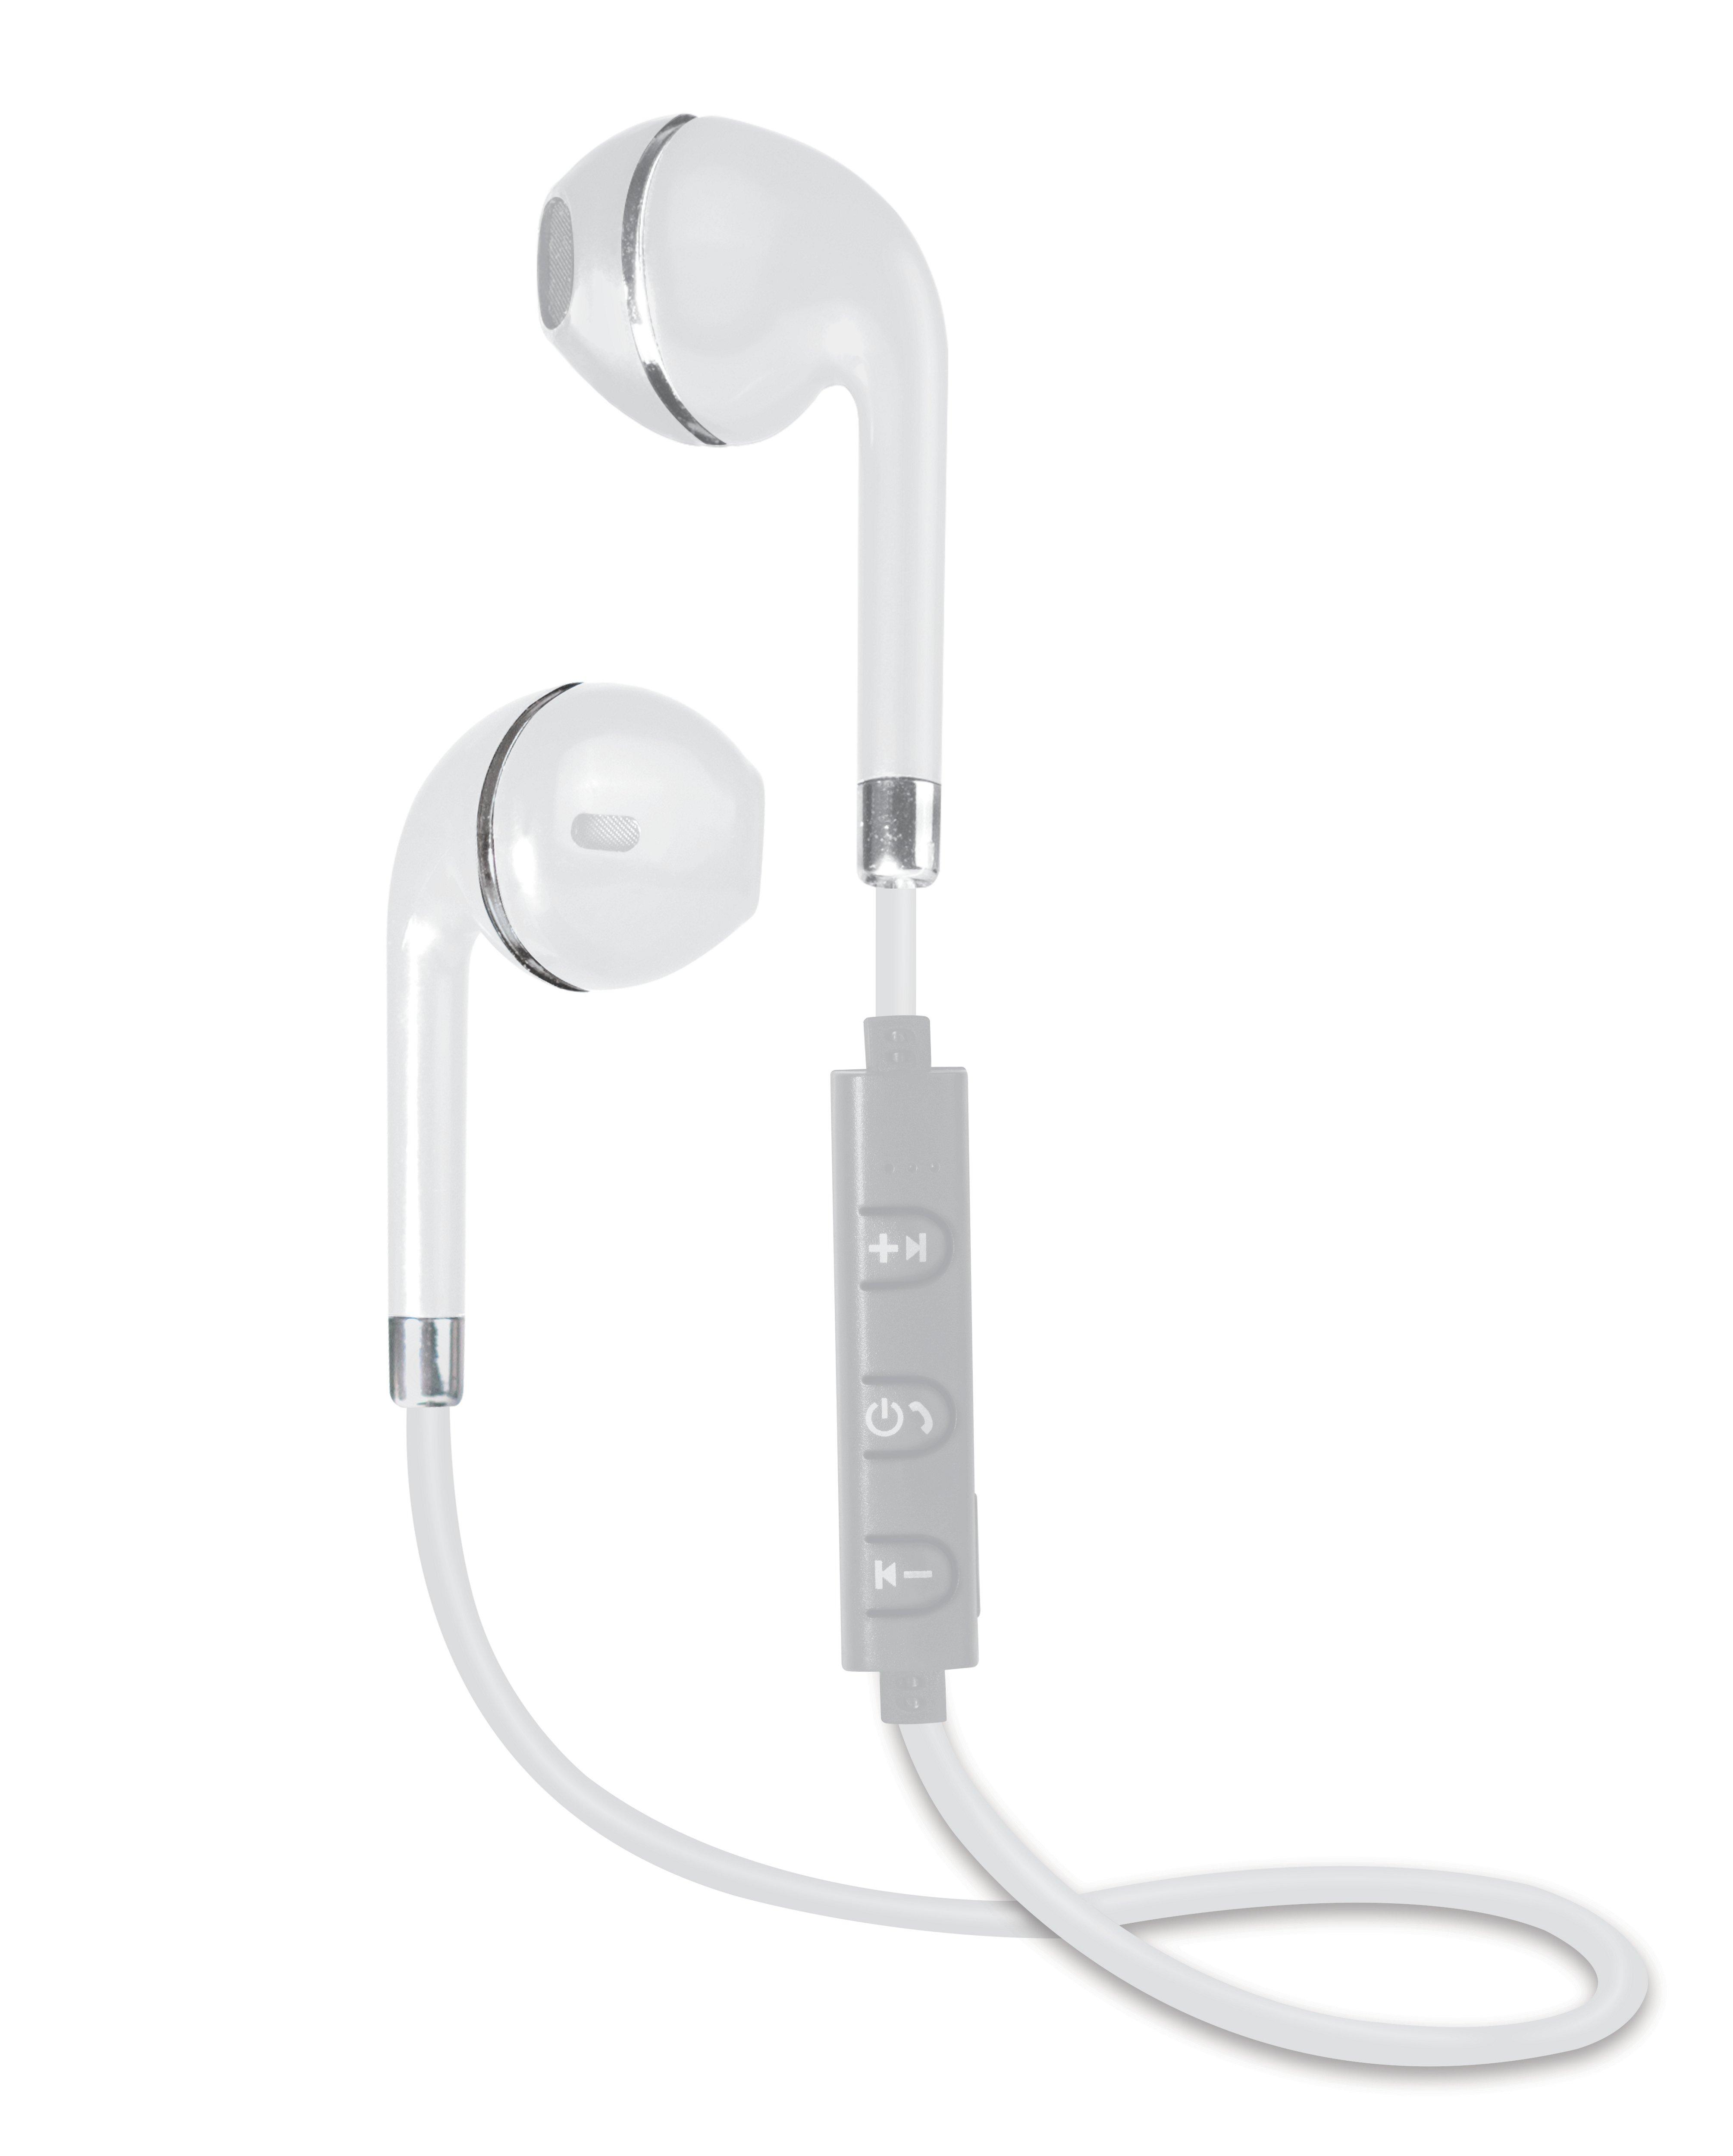 Bytech White Bluetooth Earbuds Shop Audio At H E B